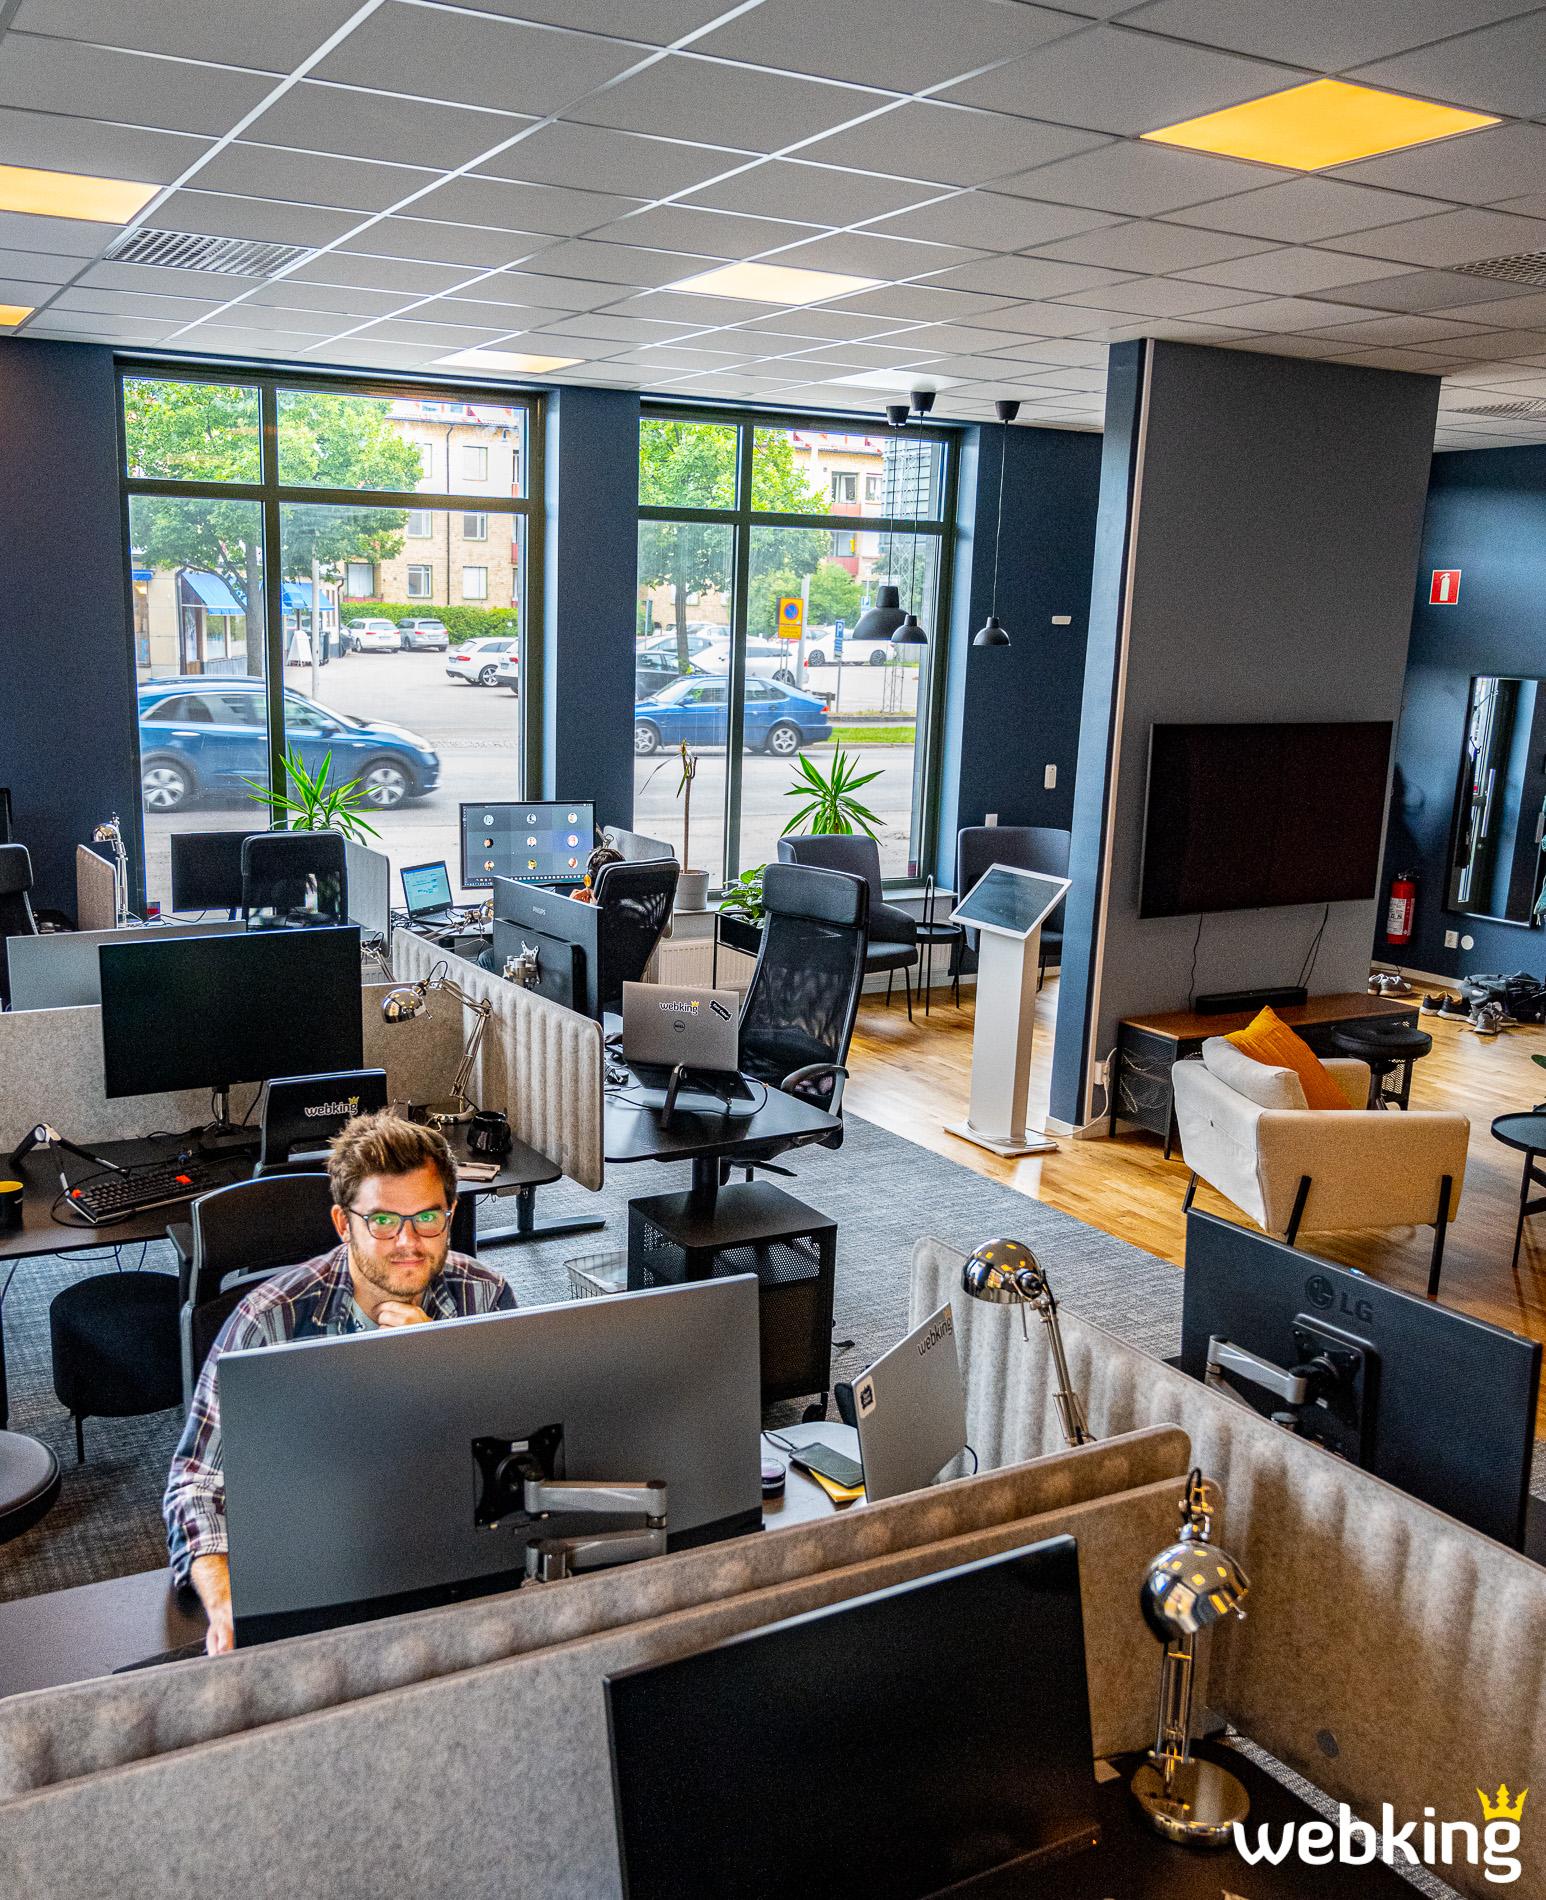 Webking har nu ett grymt bra kontor